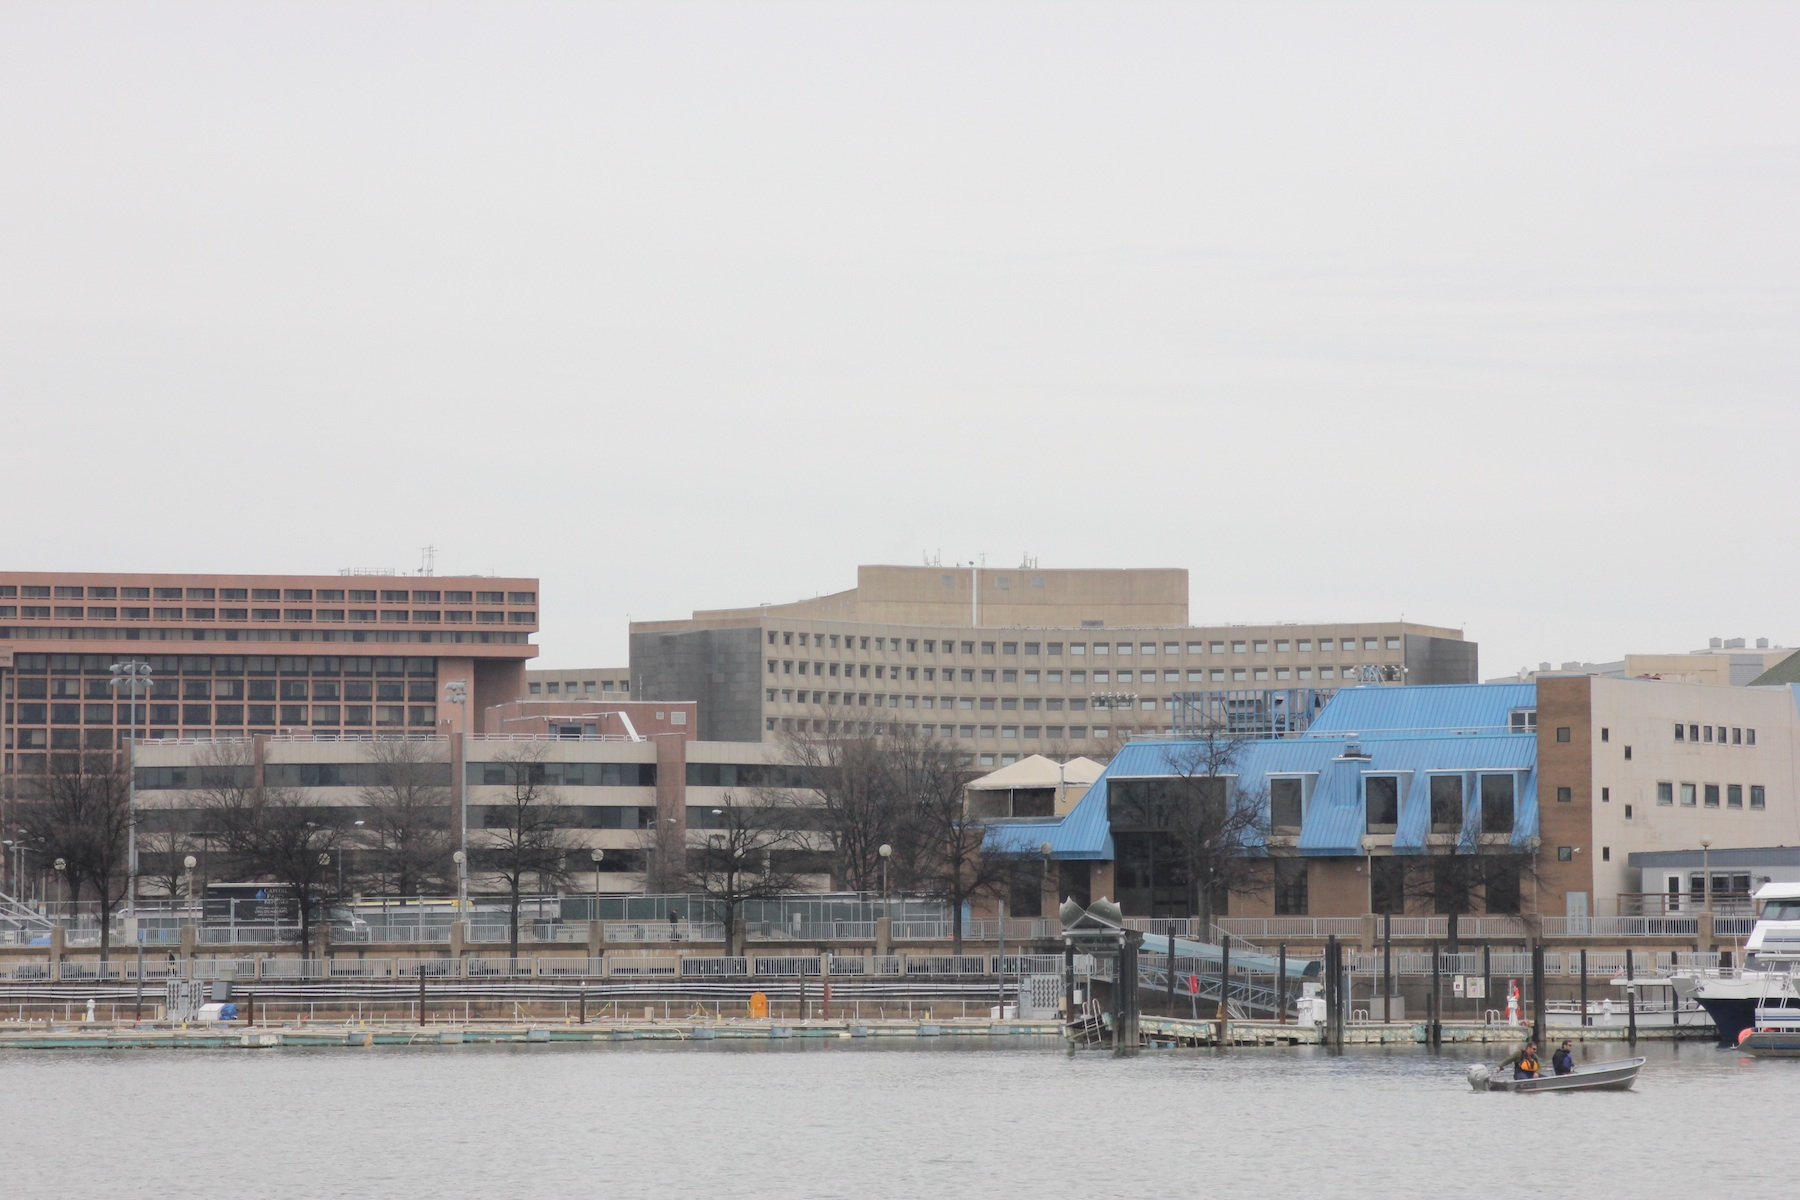 Southwest Waterfront, Washington, DC. Photo: Kate Gallery